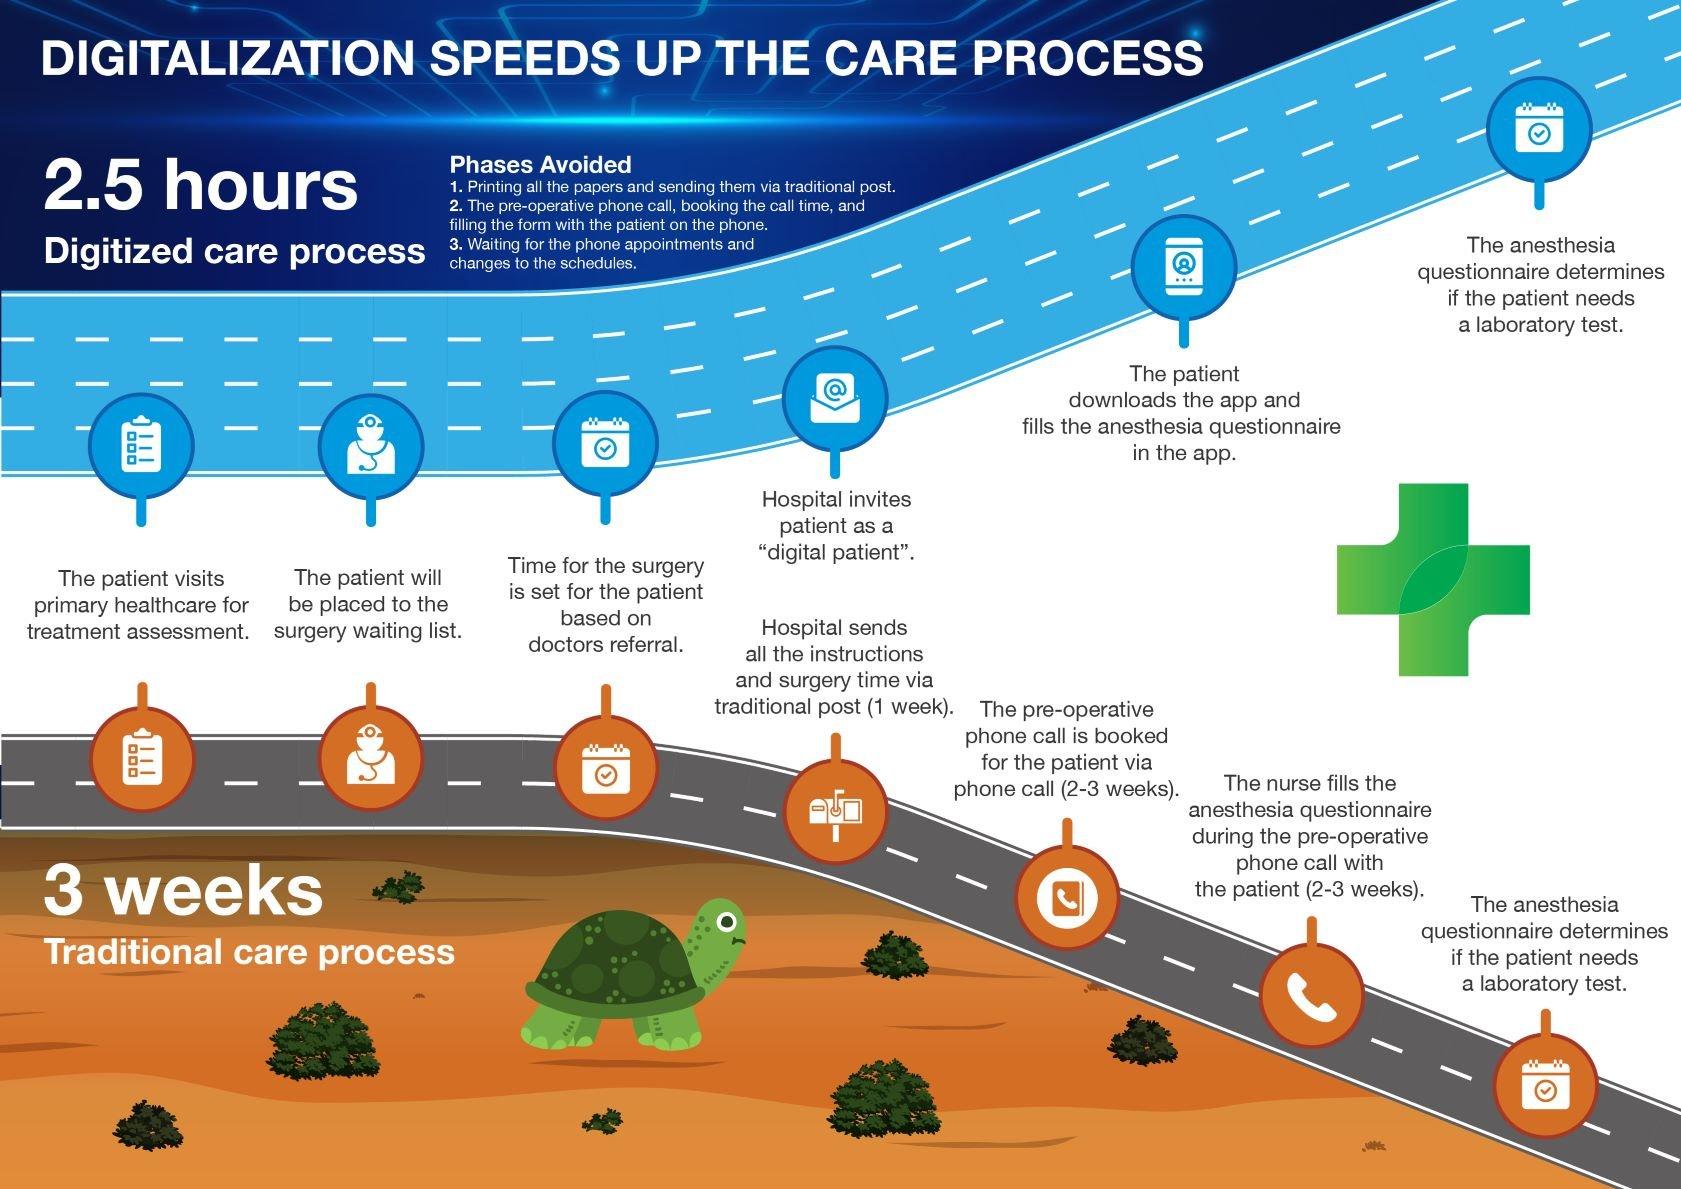 Digitalization speeds up care_process_medium